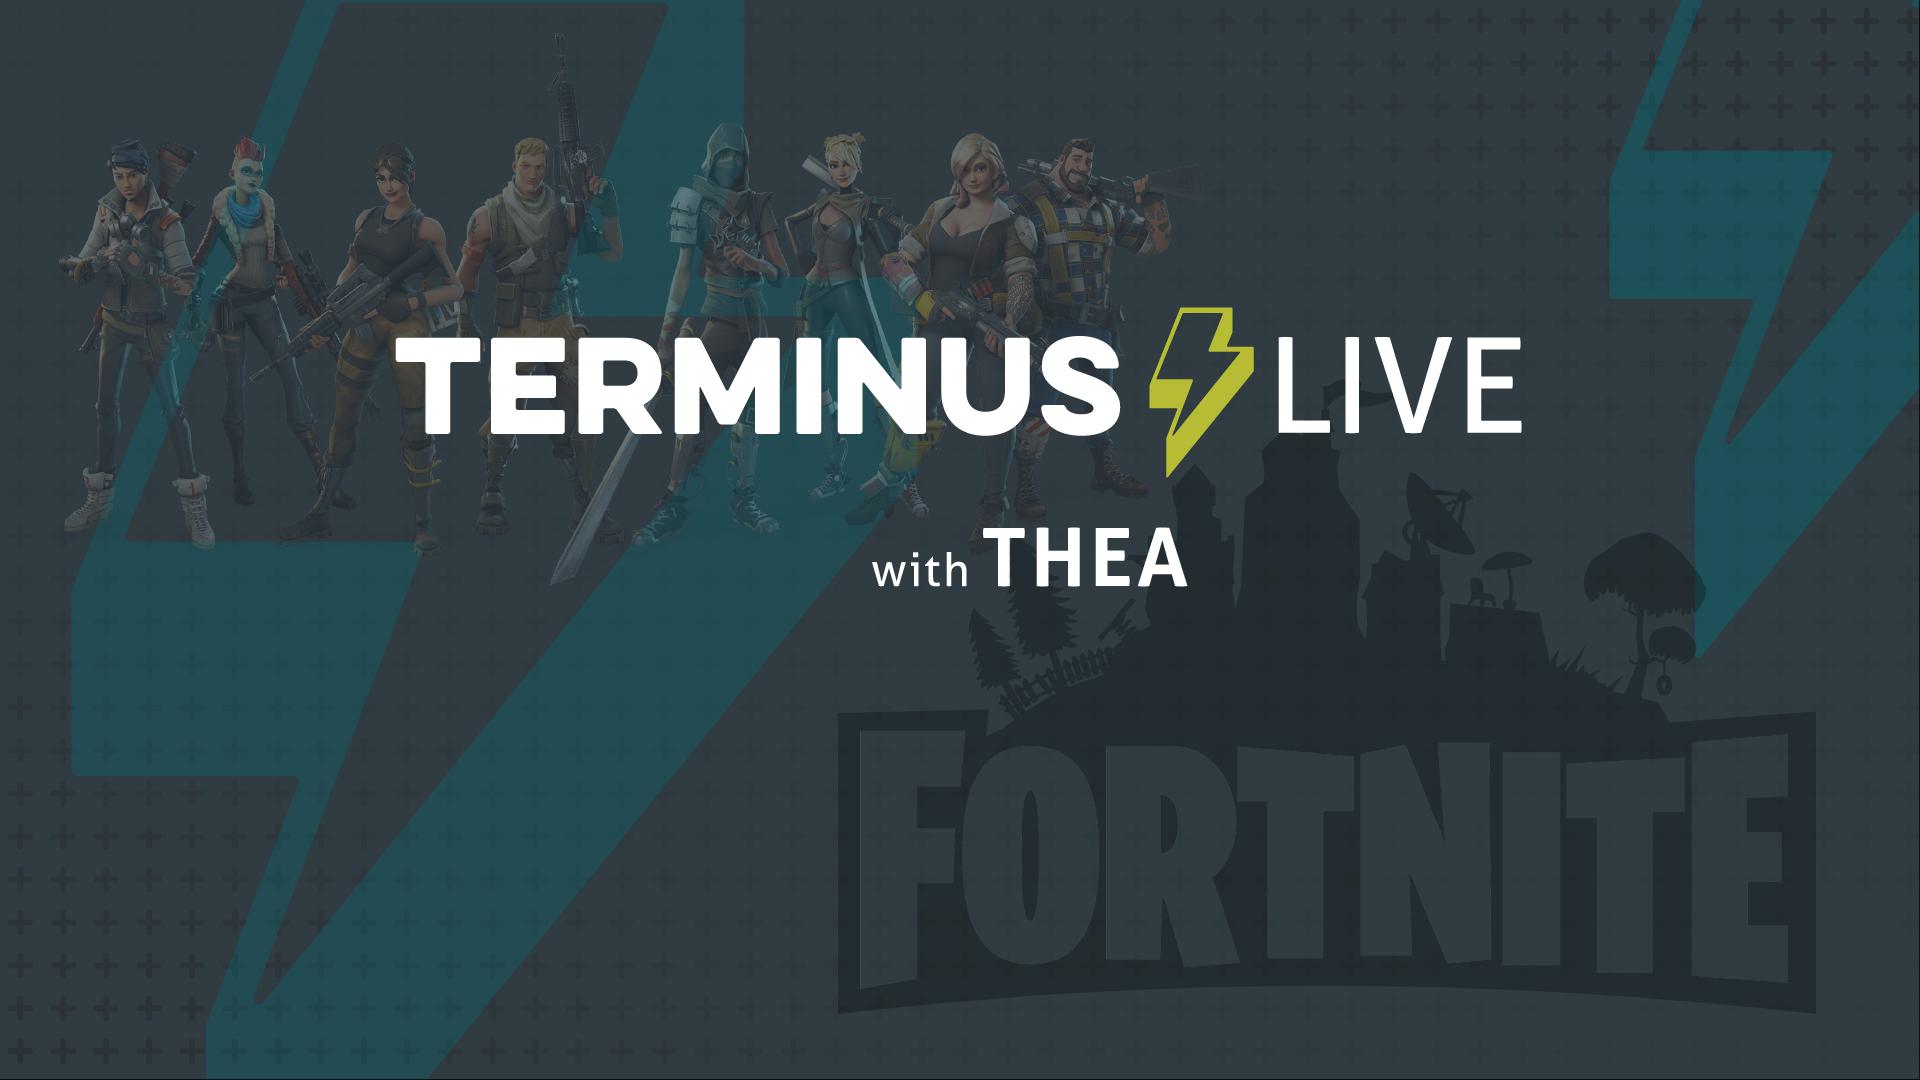 TERMINUS Live: Simeon & Nick from THEA play Fortnite